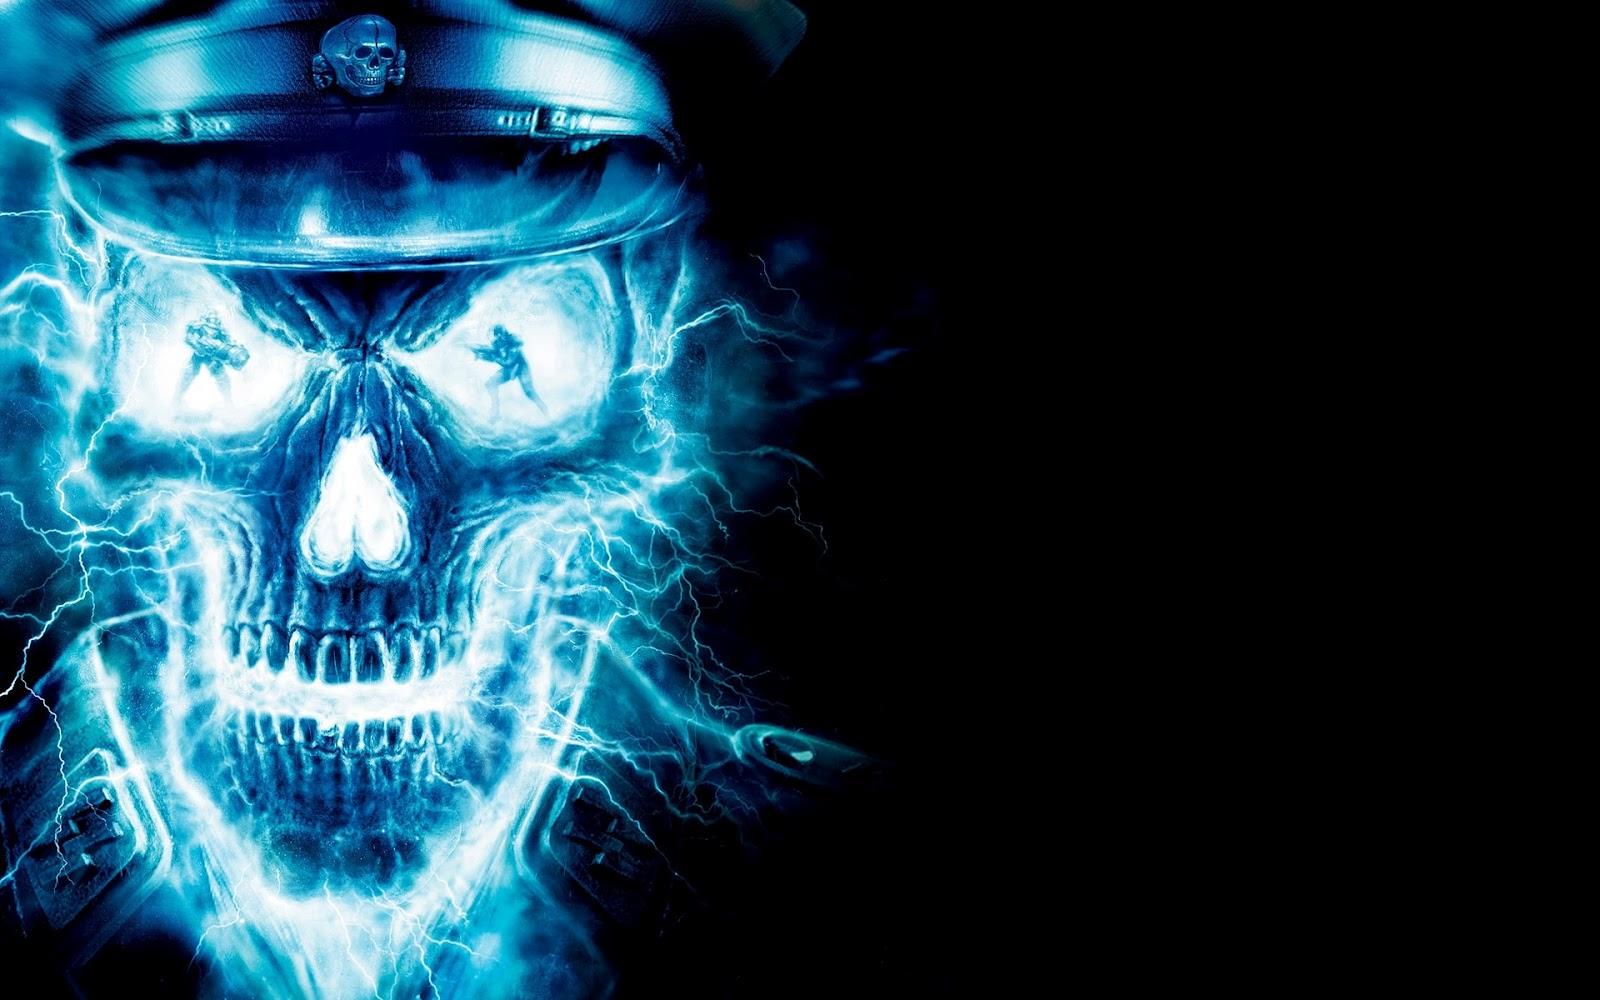 Blue Flaming Skull Backgrounds